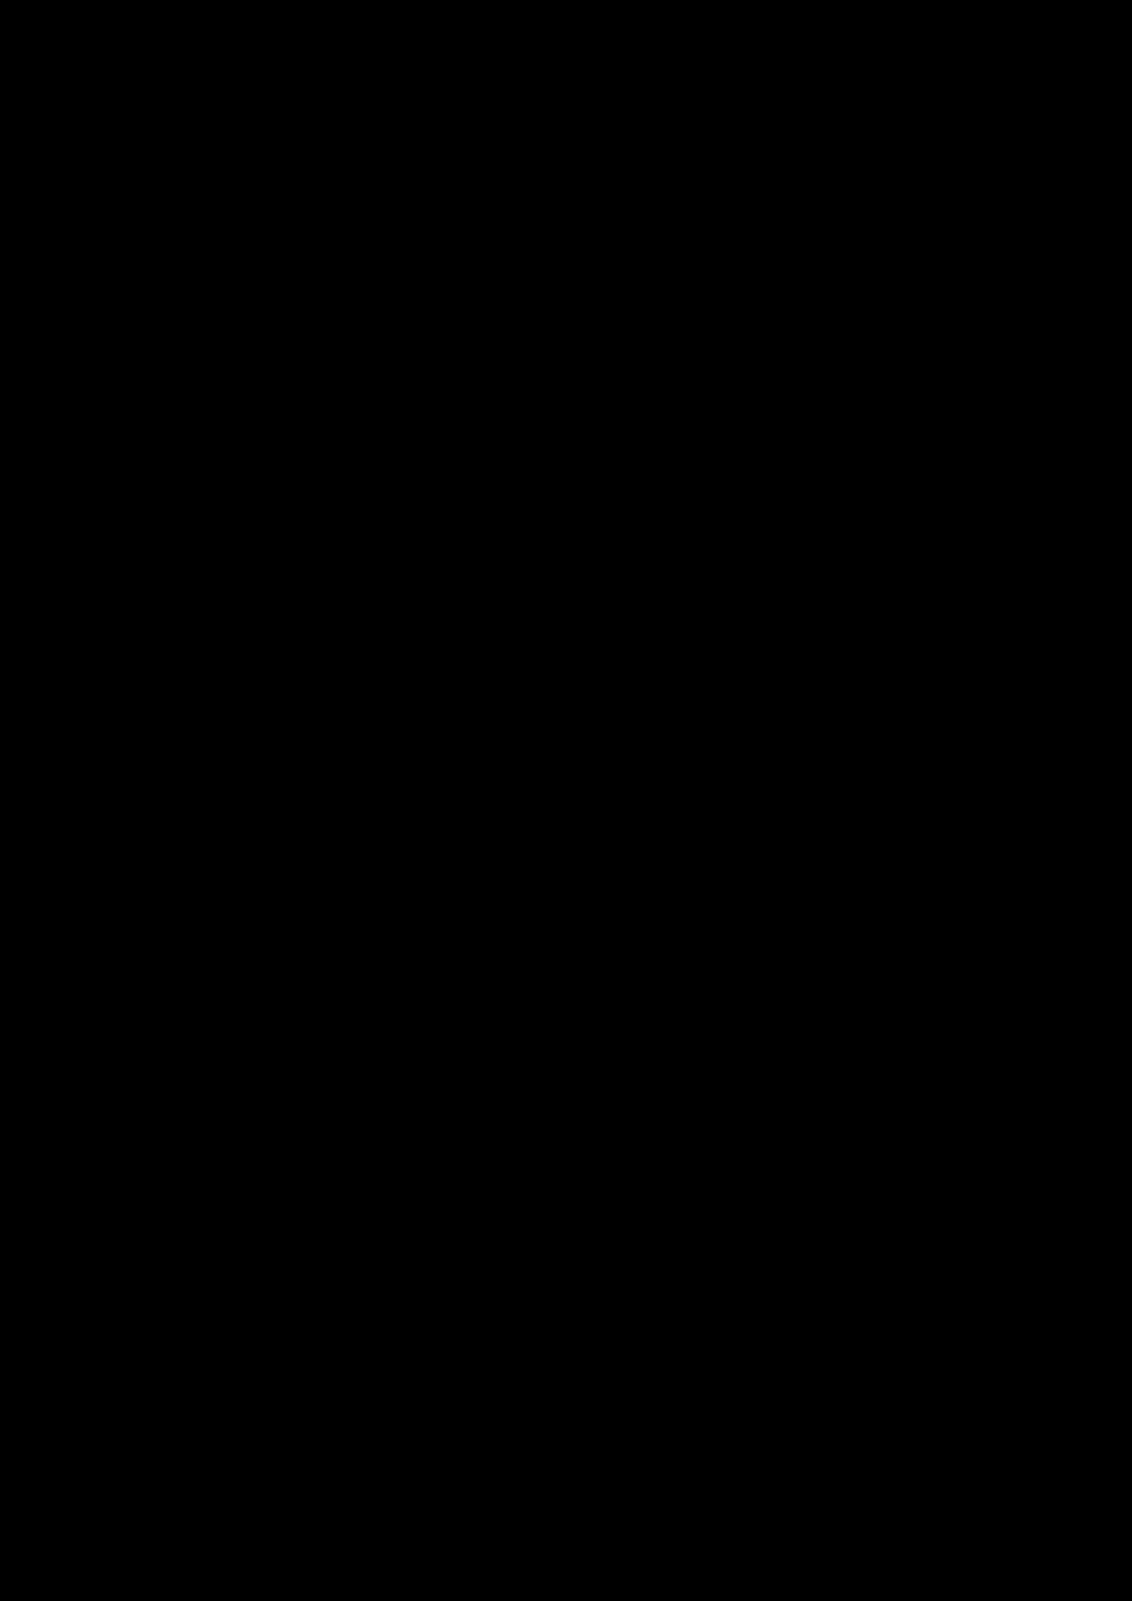 Belyiy sokol slide, Image 22